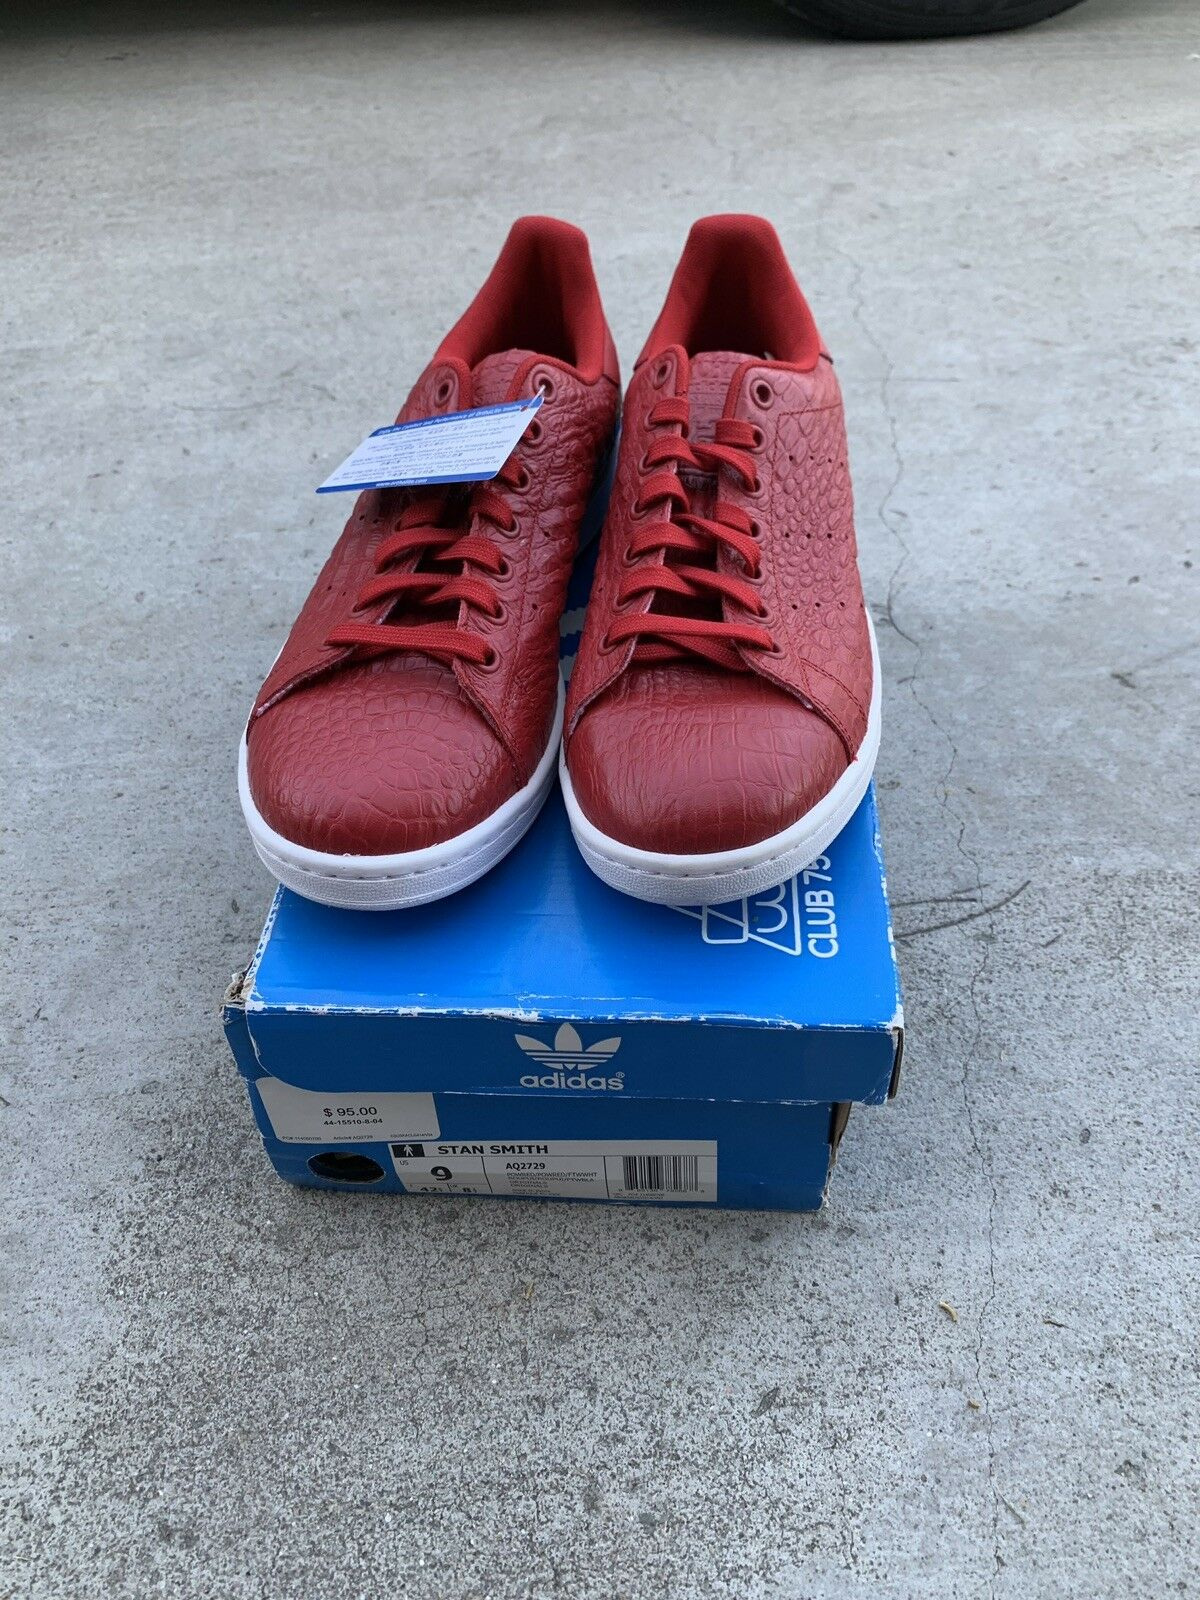 Adidas Stan Smith Smith Smith röd Storlek 9 AQ2729 Deadstock  köp 100% autentisk kvalitet